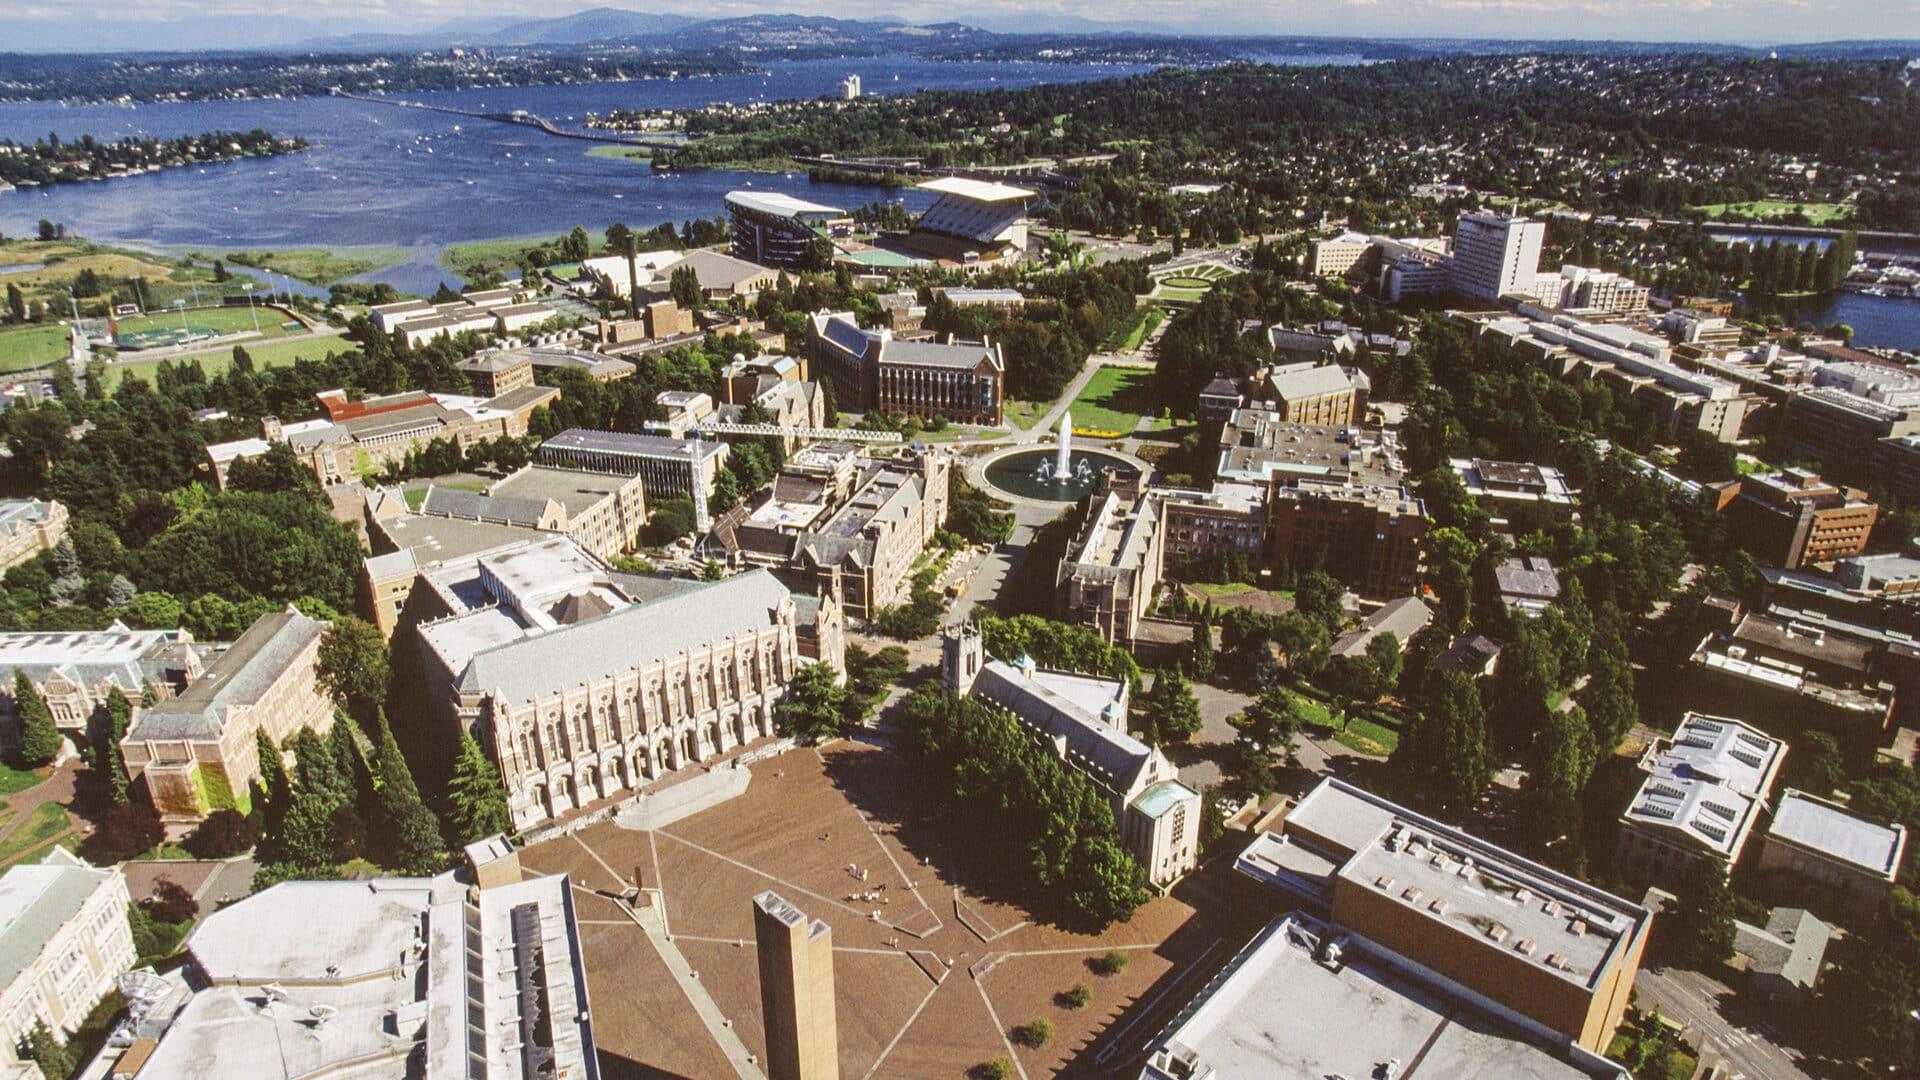 University of Washington Aerial View